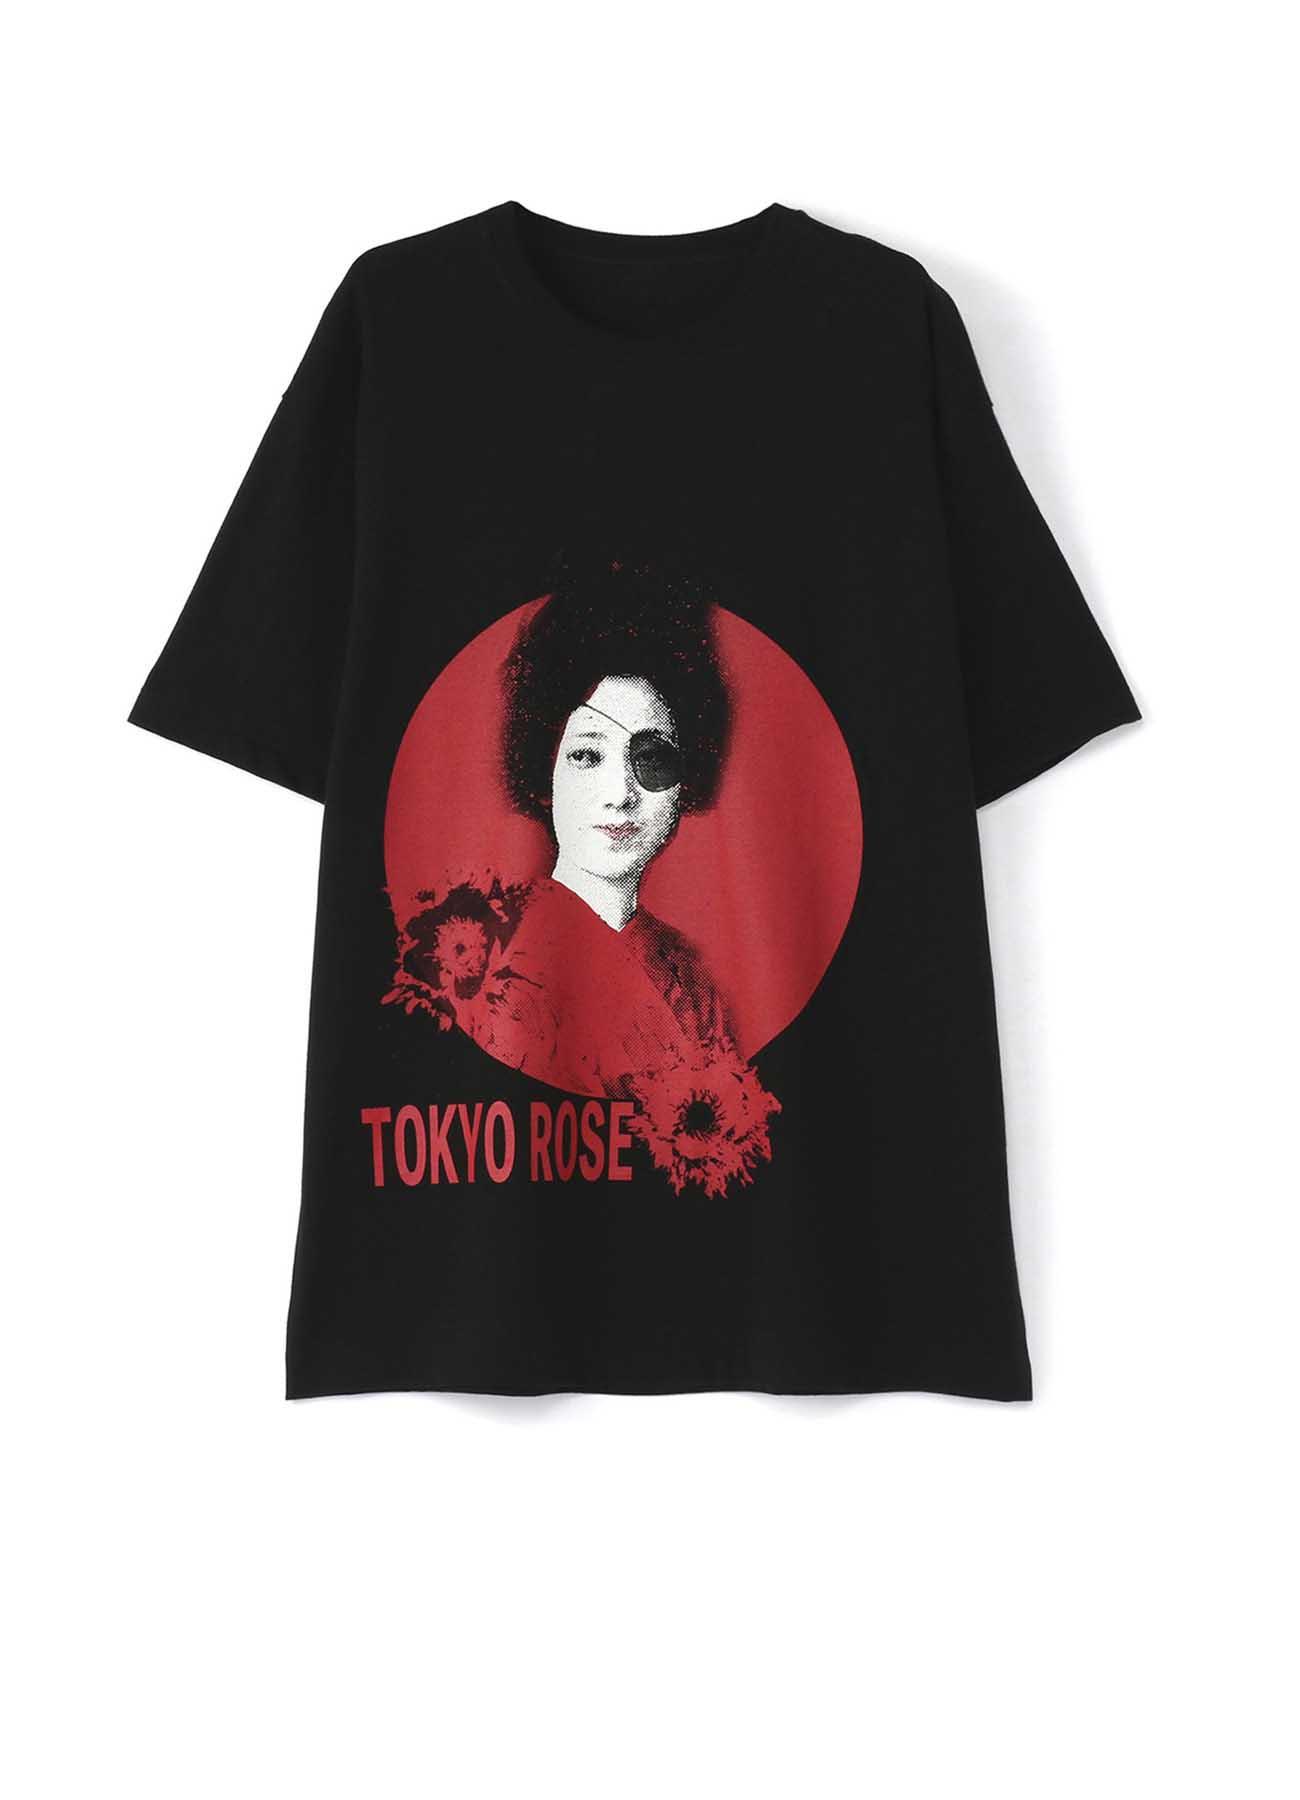 20/CottonJersey Tokyo Rose T-Shirt